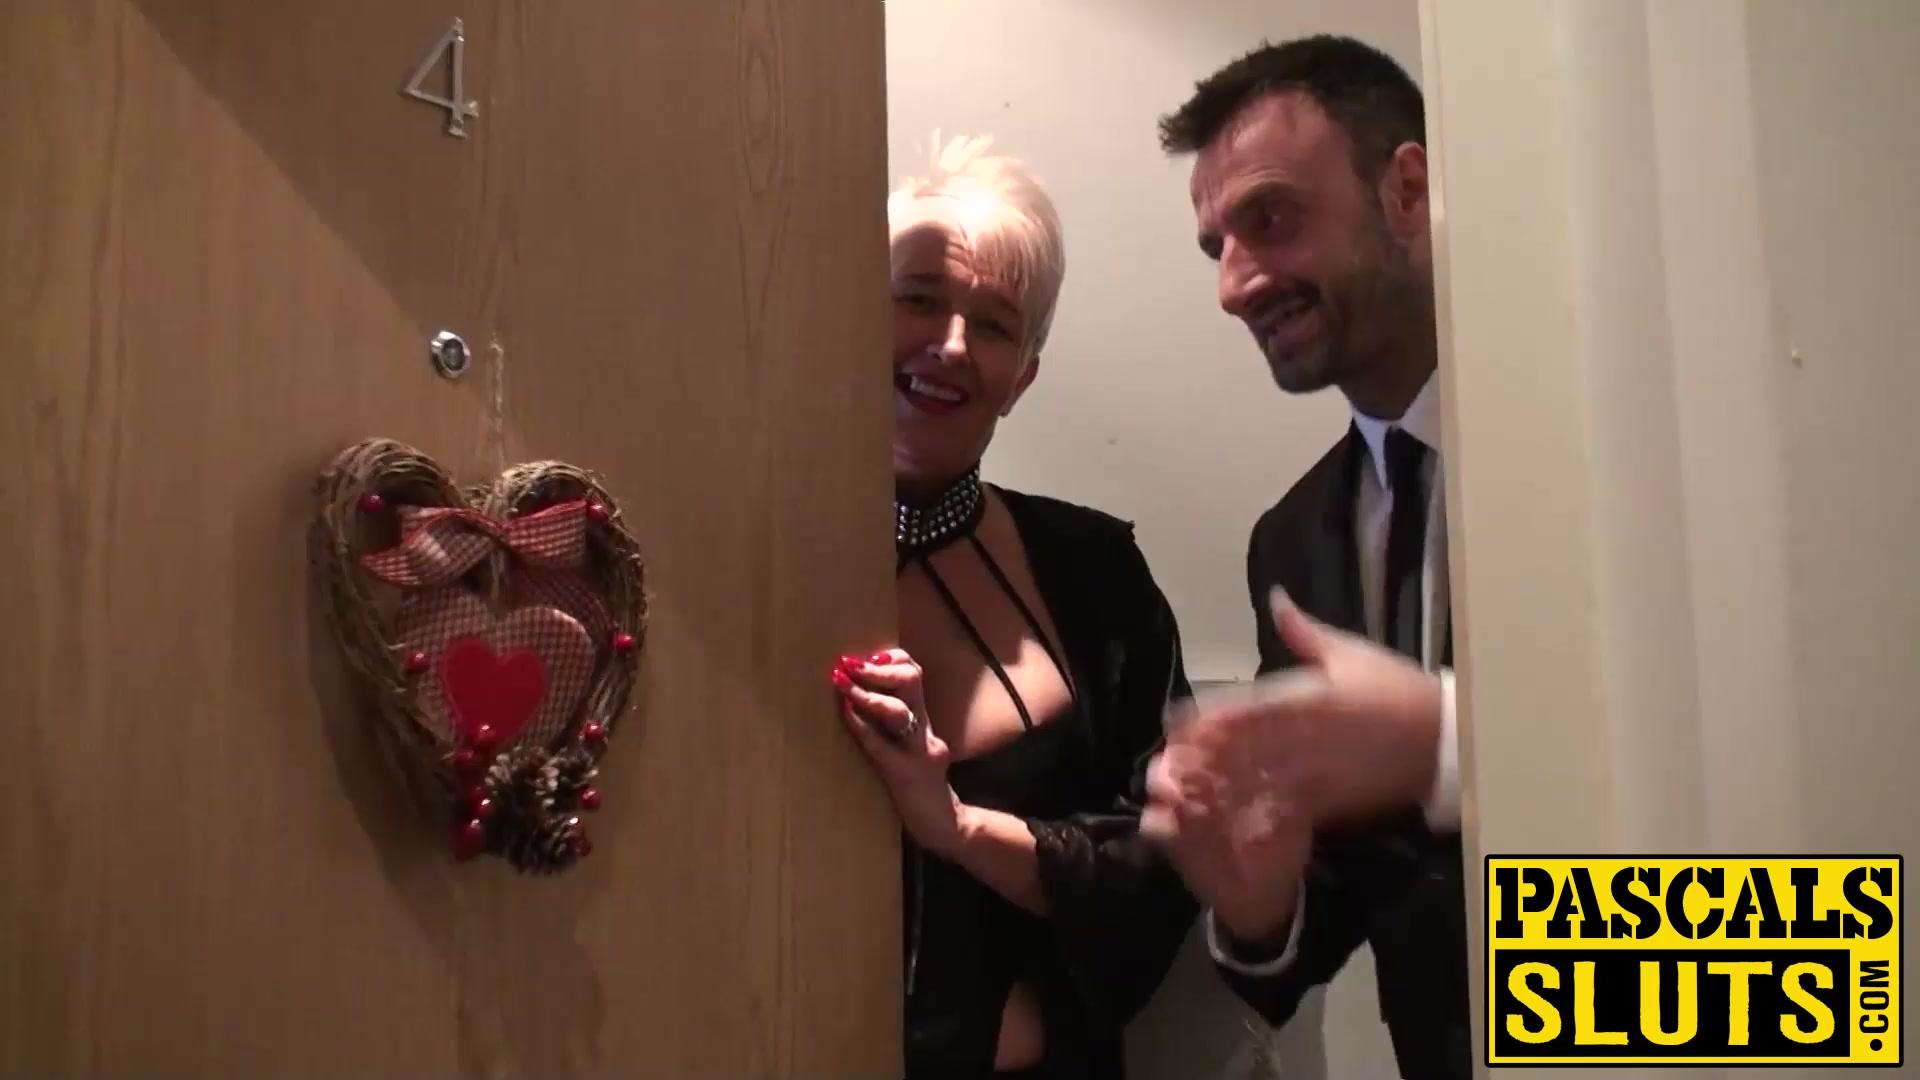 Excellent porn Autovettori calcolo online dating